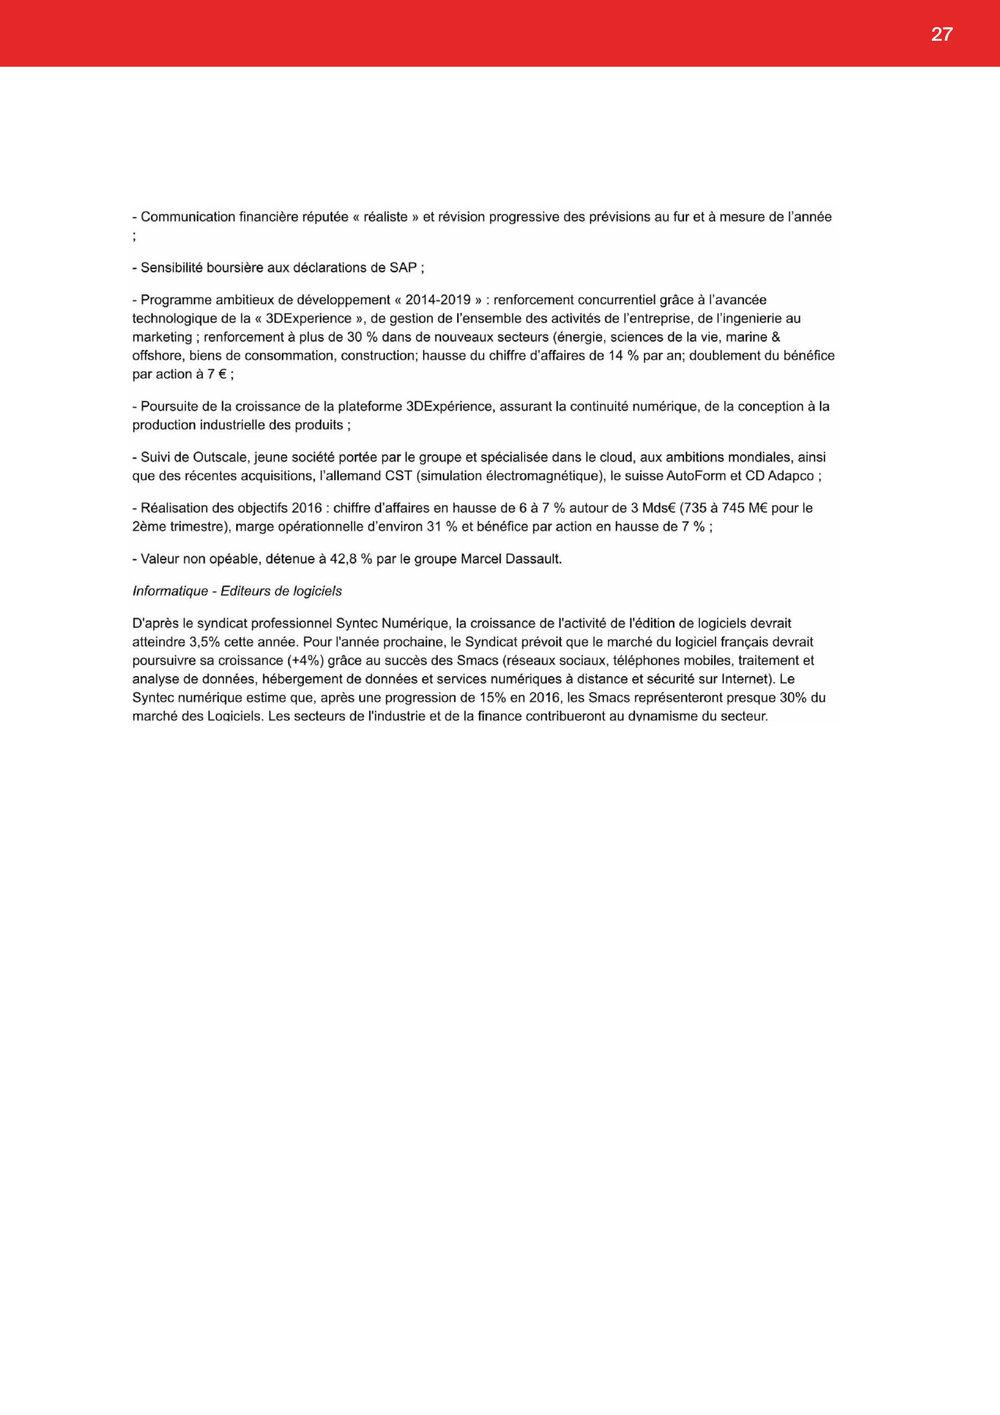 BOOKMEDIA_JUILLET_027.jpg